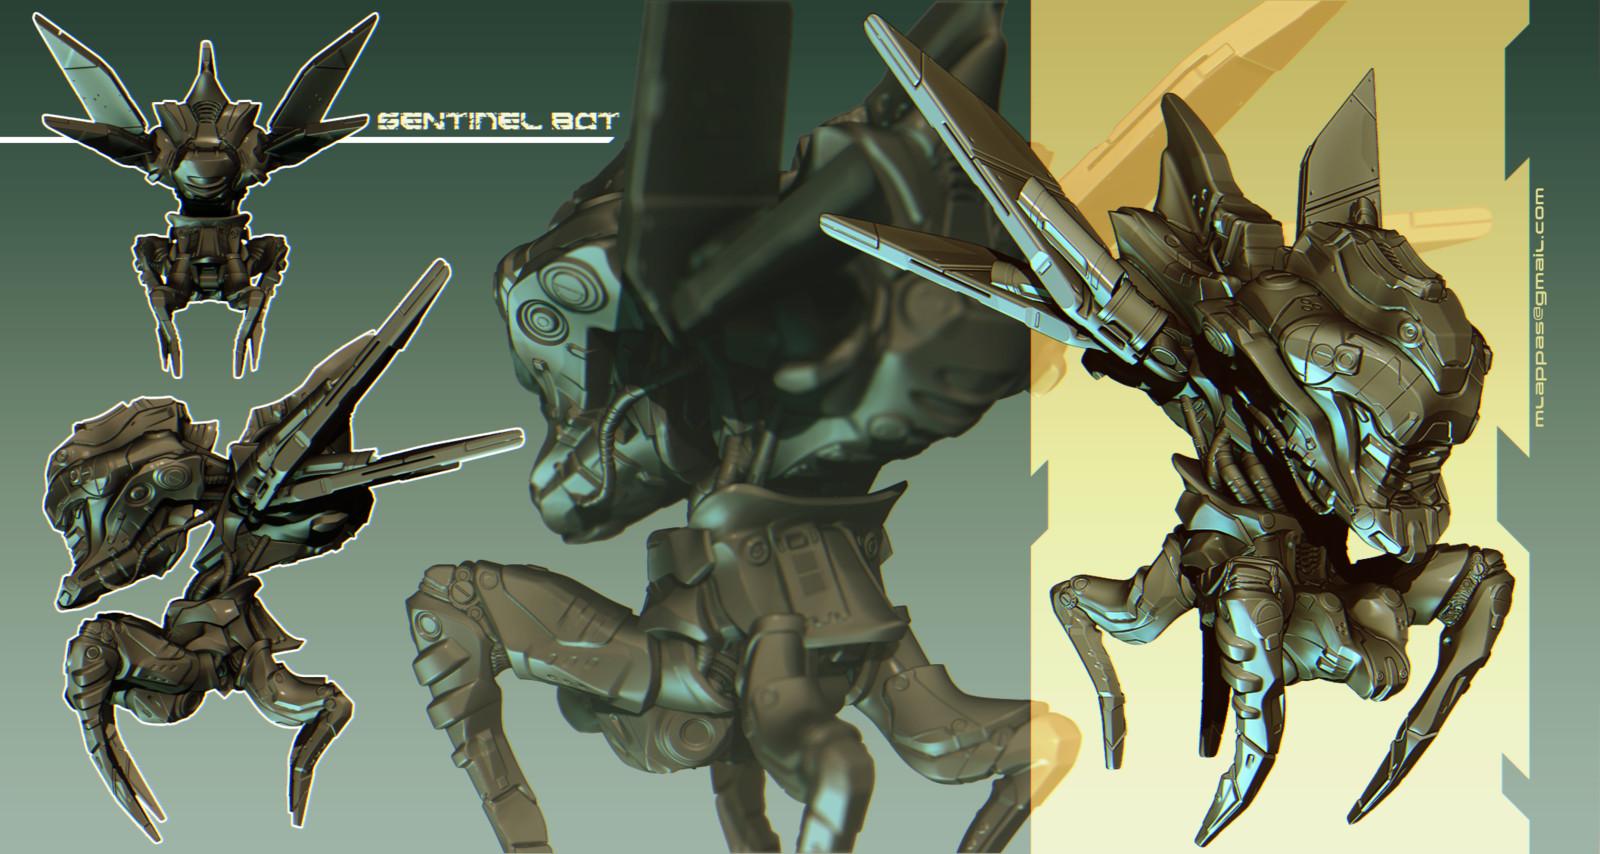 Sentinel Bot 3D concept